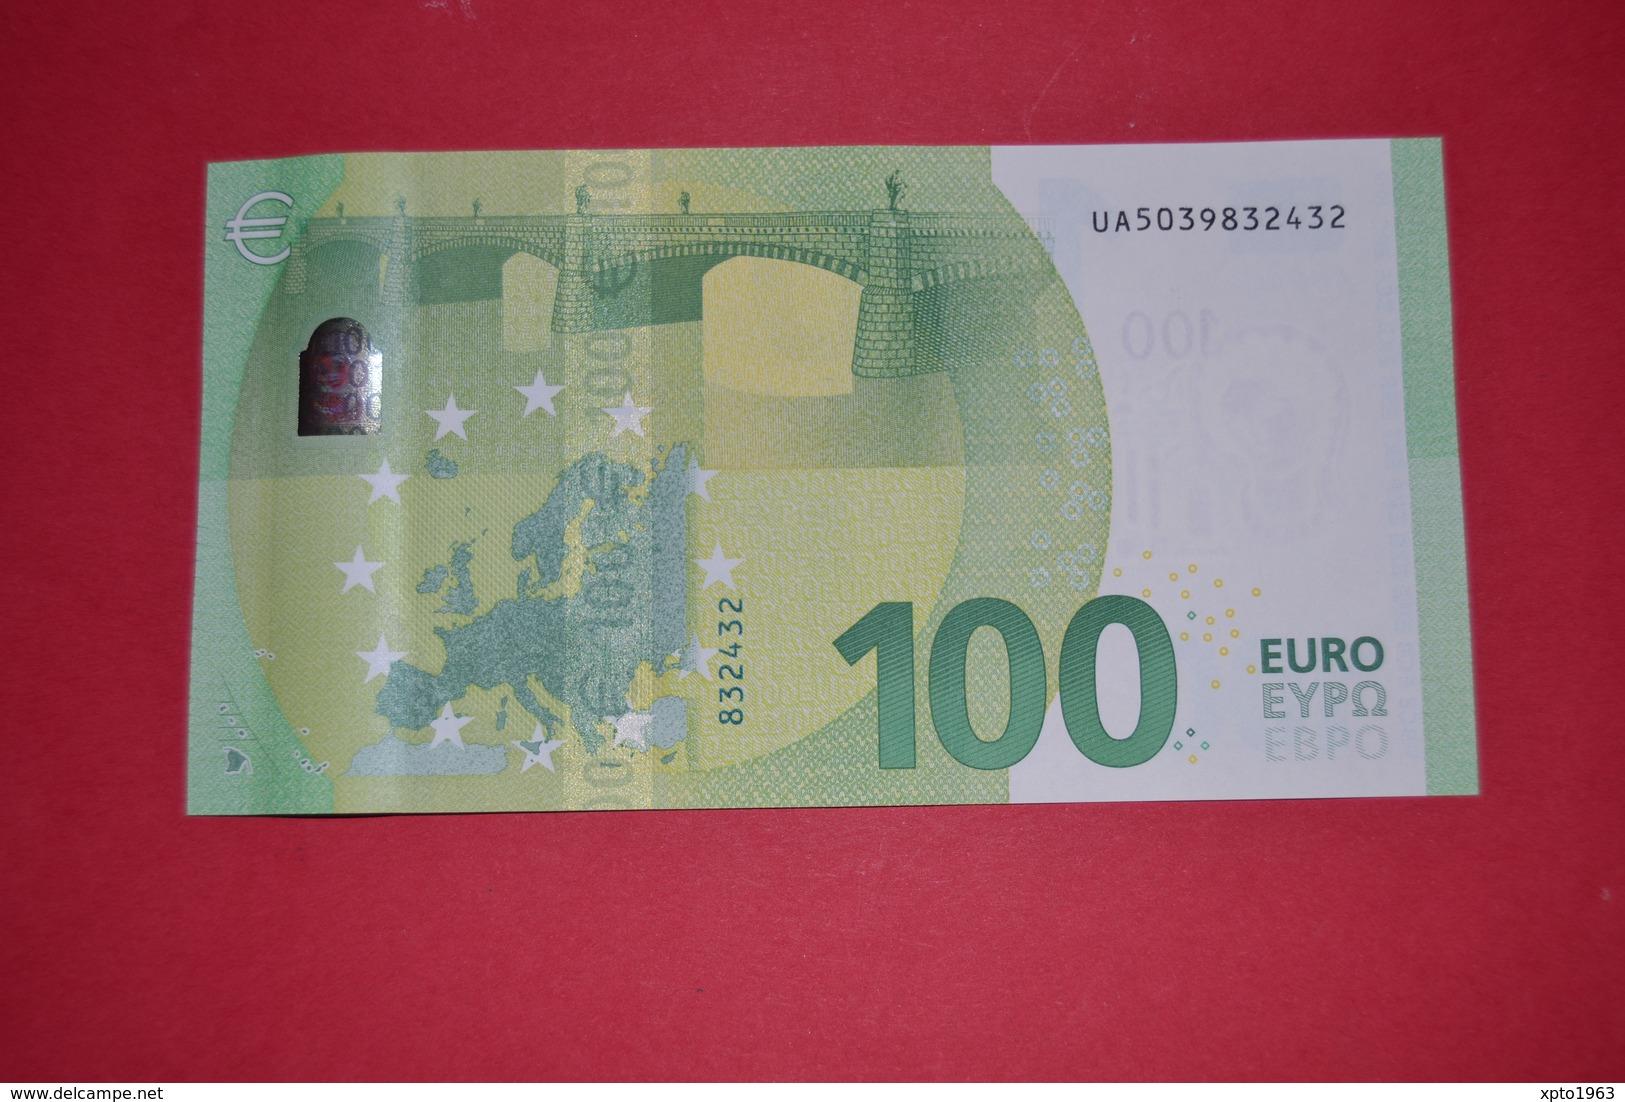 FRANCE 100 EURO - U002G1 - Série Europa - UNC NEUF - EURO